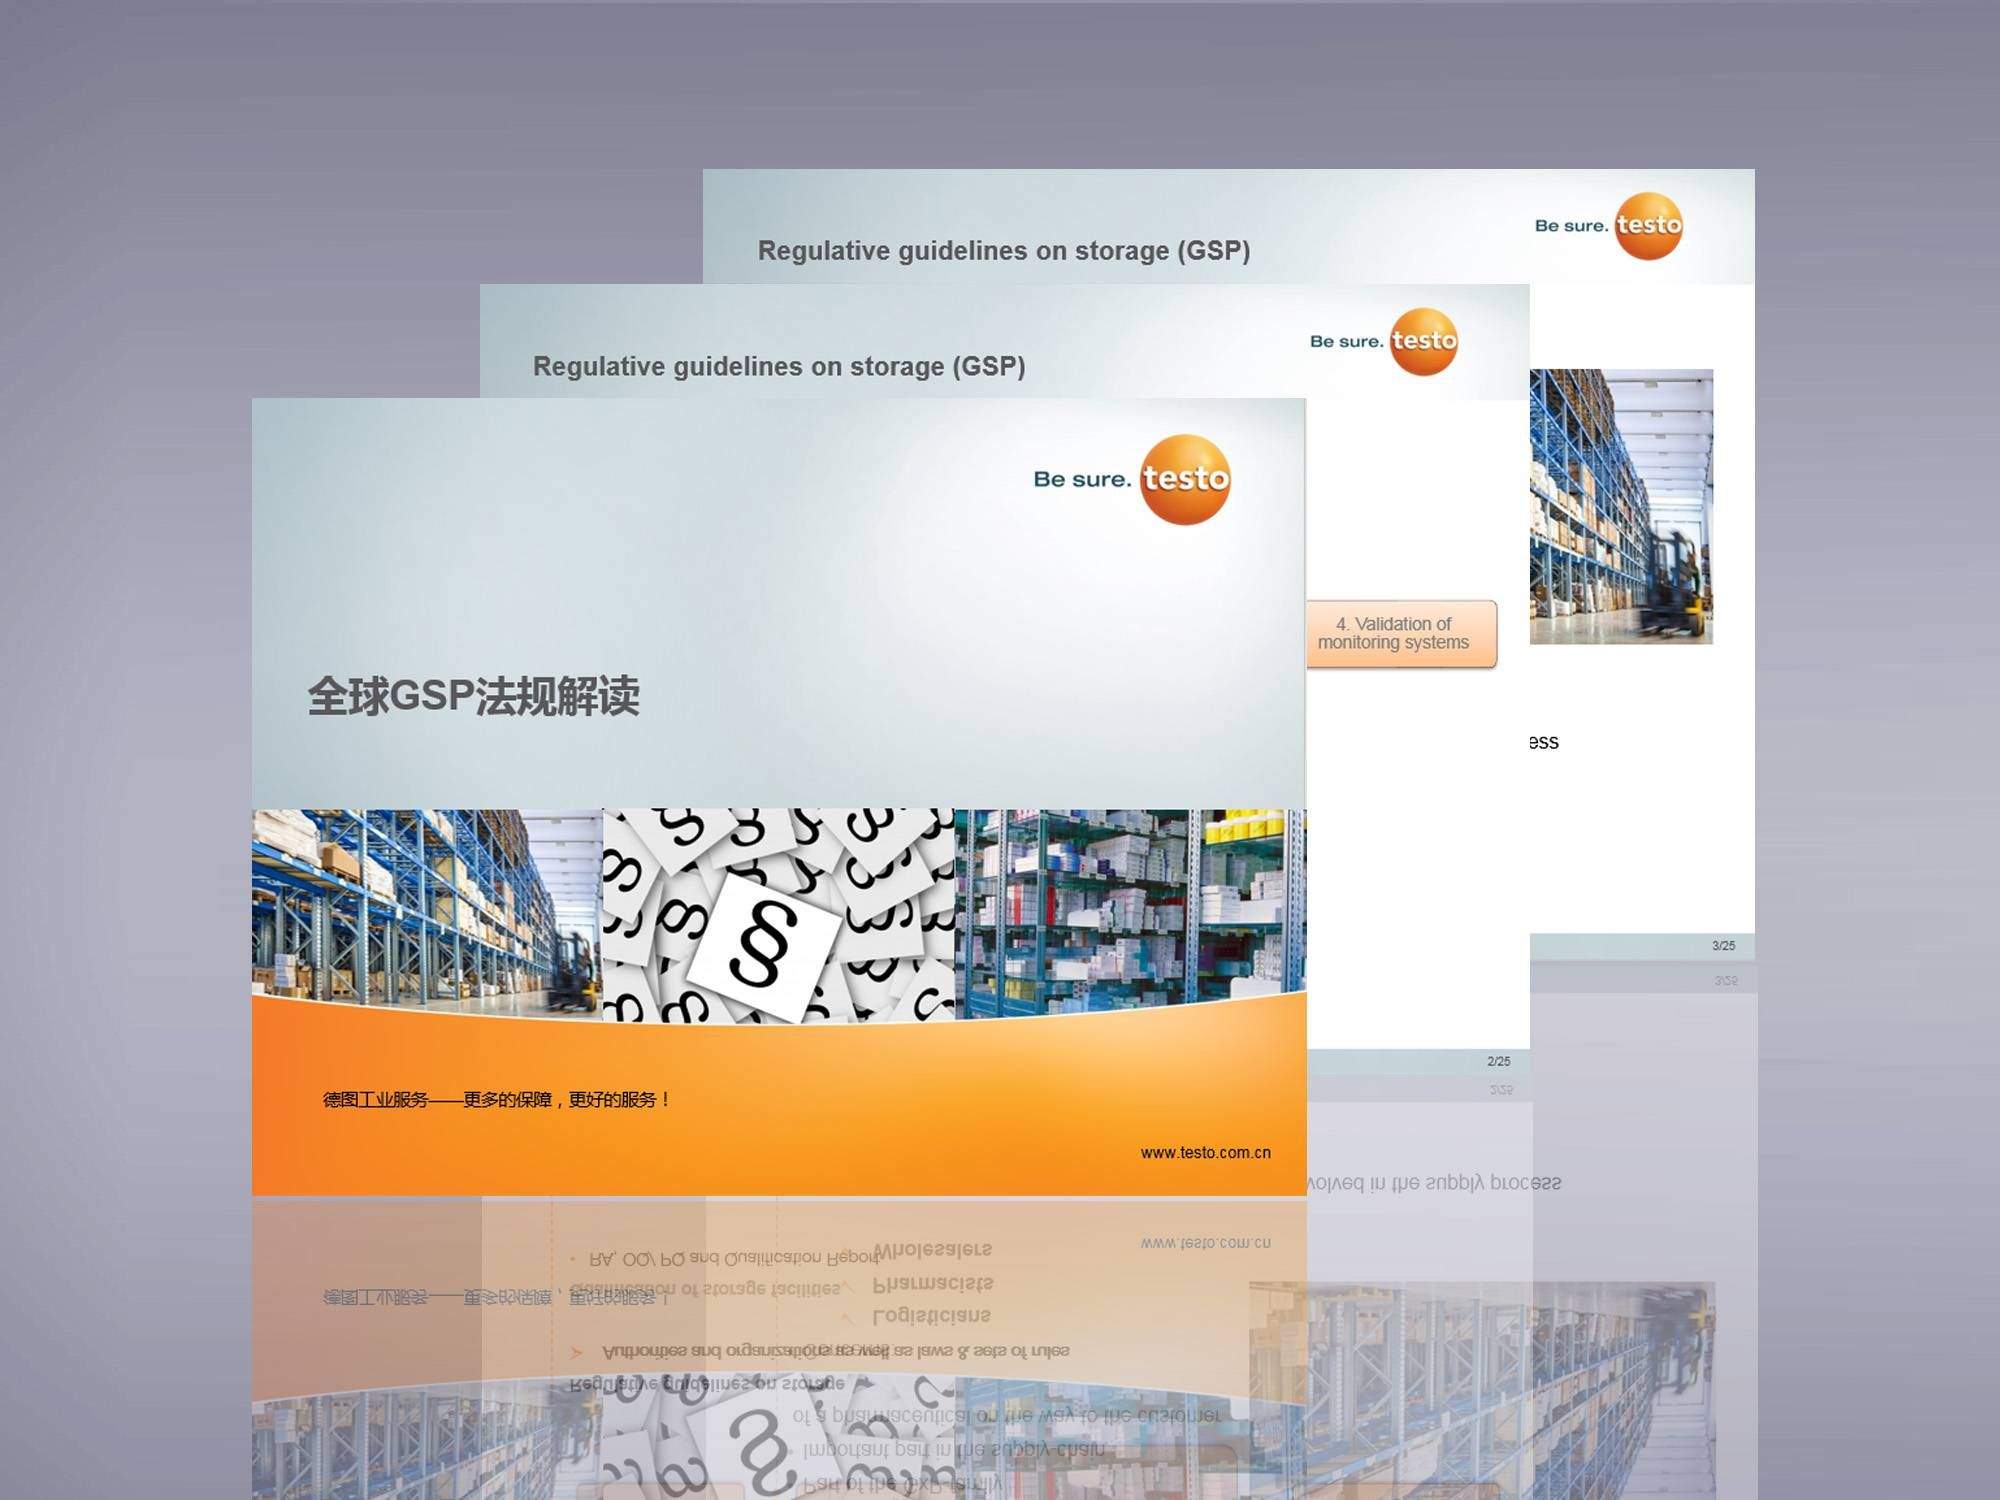 cn-20170614-Pharma-coldchain-2000x1500-download-GSP.jpg